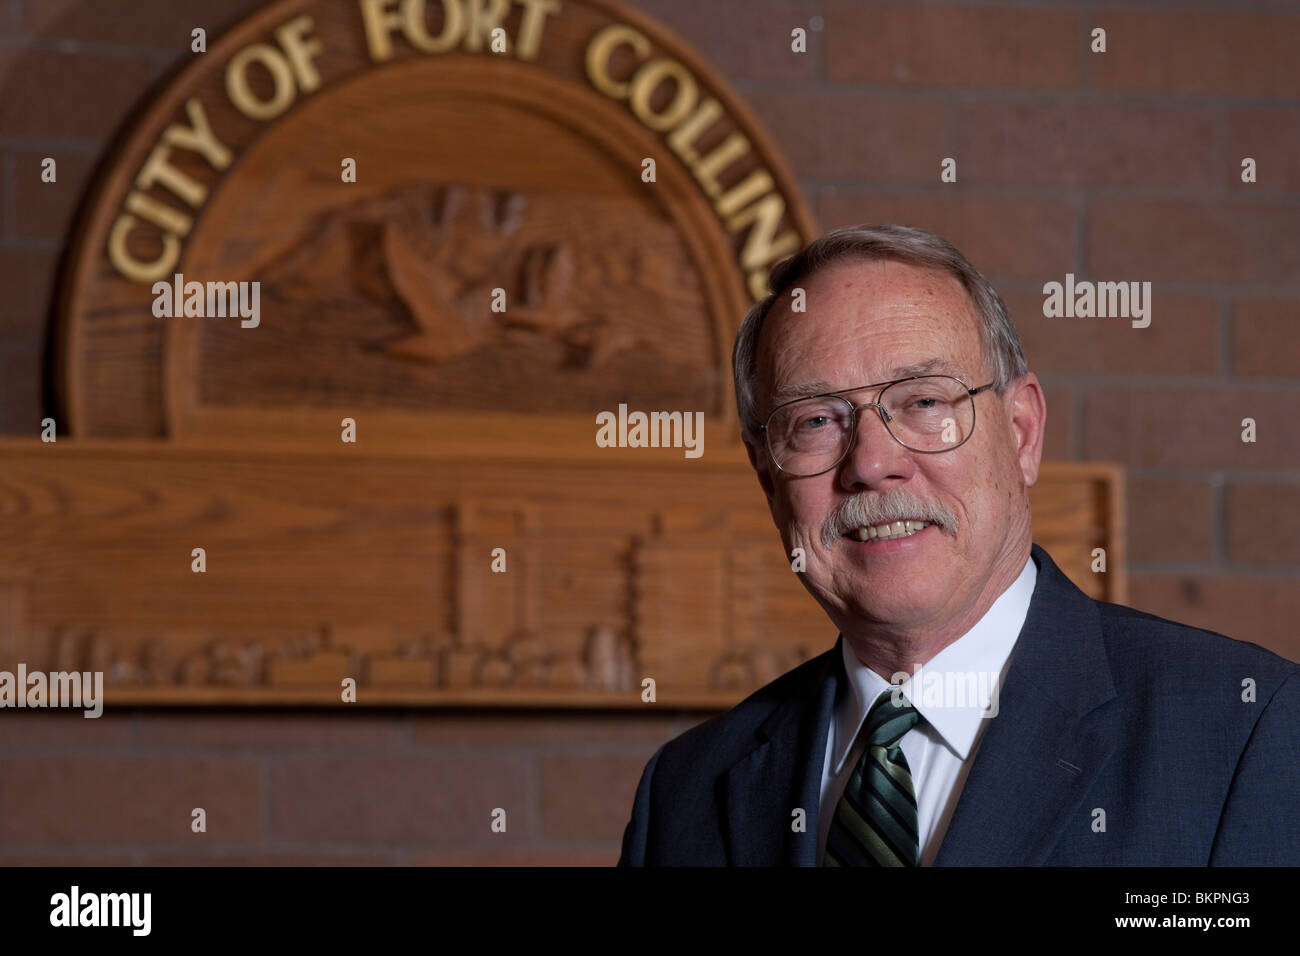 Portrait of City of Fort Collins, Colorado Mayor Doug Huchinson - Stock Image